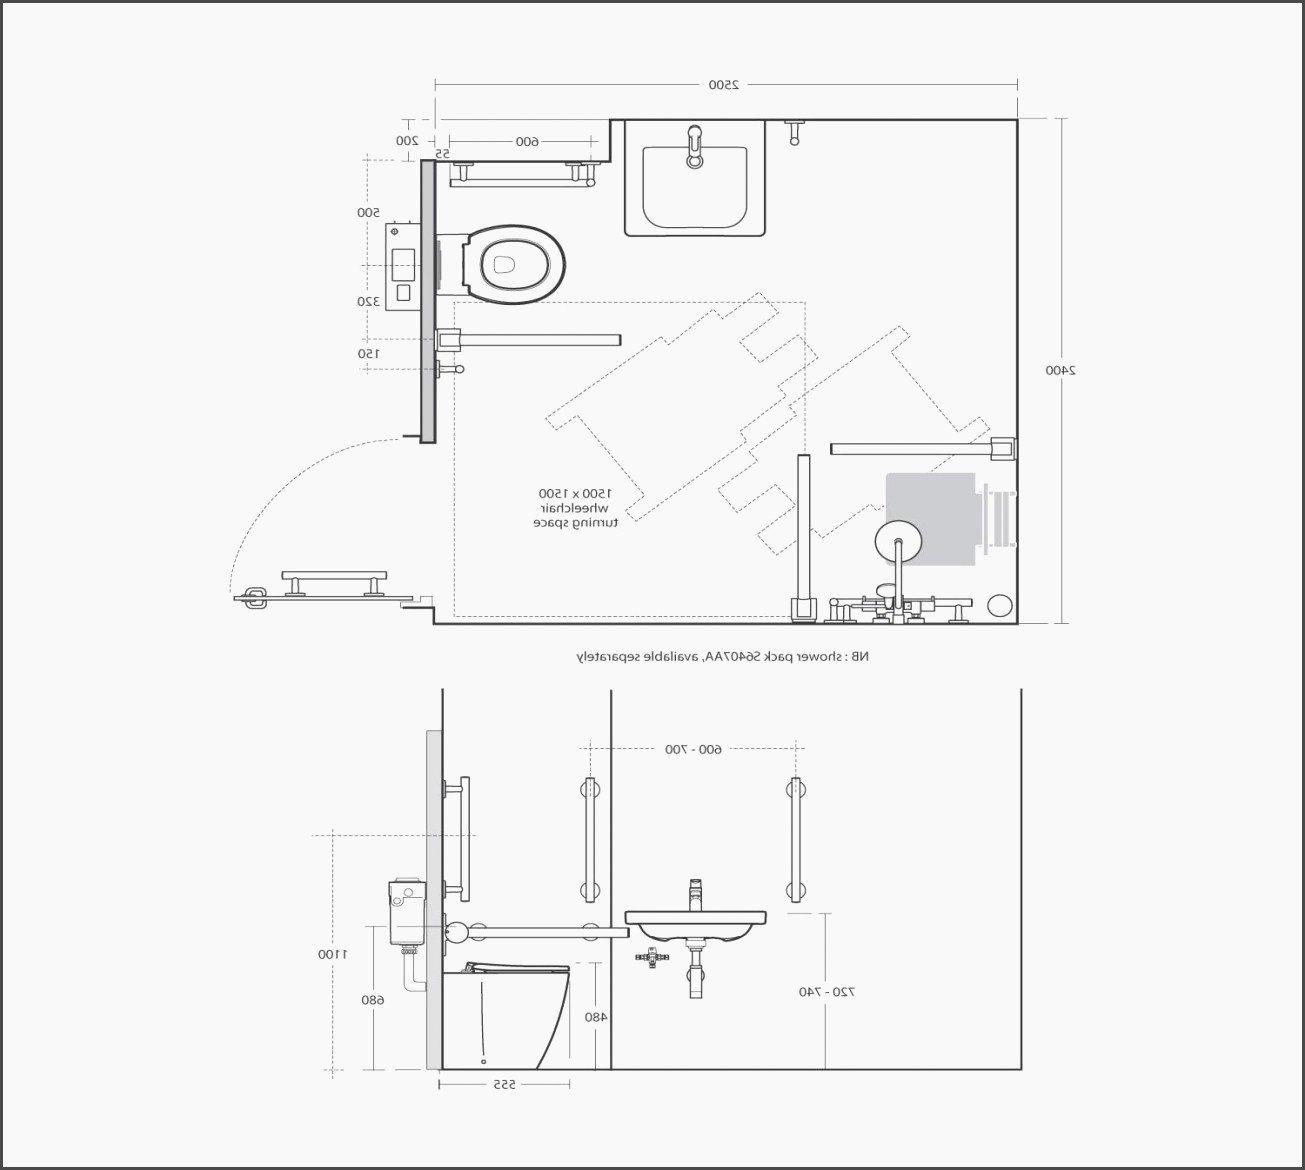 Warehouse Floor Plan Template Inspirational Warehouse Floor Plan Sample